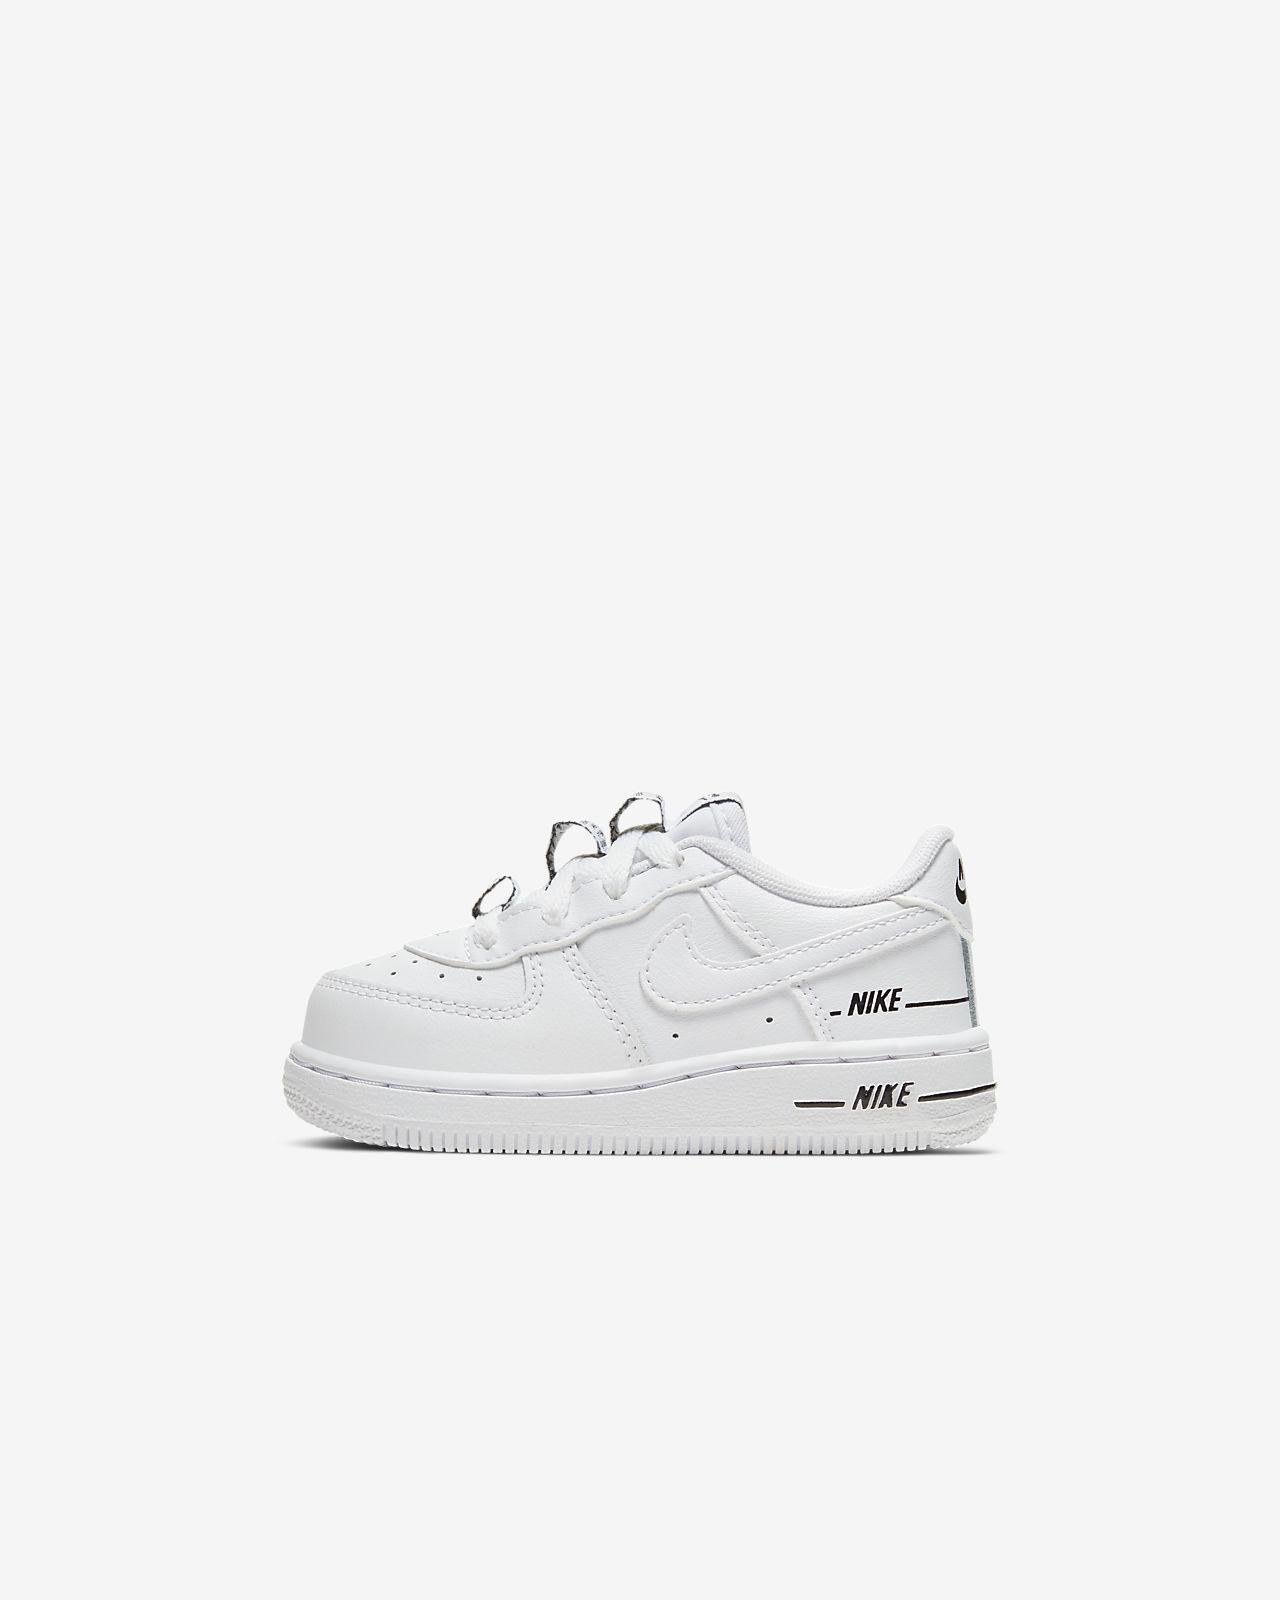 Nike | Air Force 1 Low LV8 Sneaker (Toddler & Little Kid